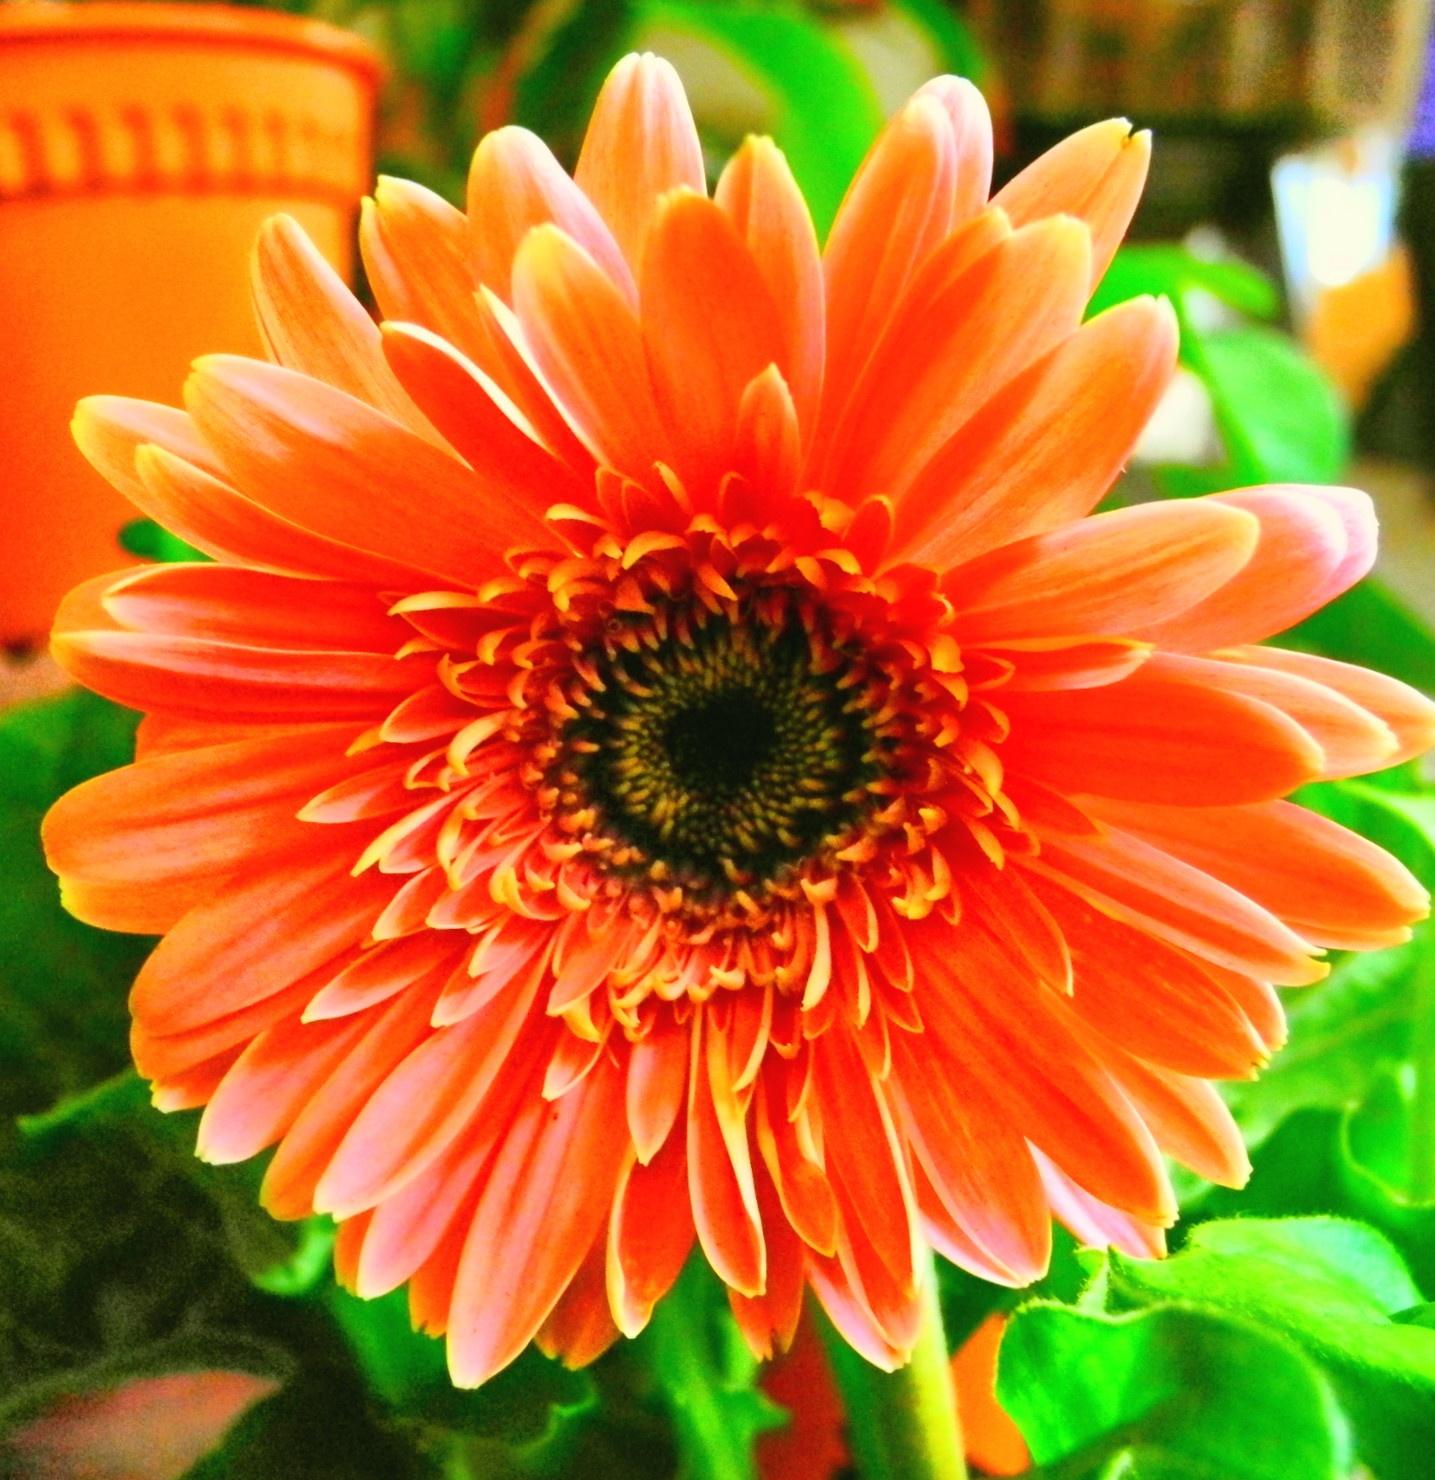 But not a grateful flowers by Sultan Firaun